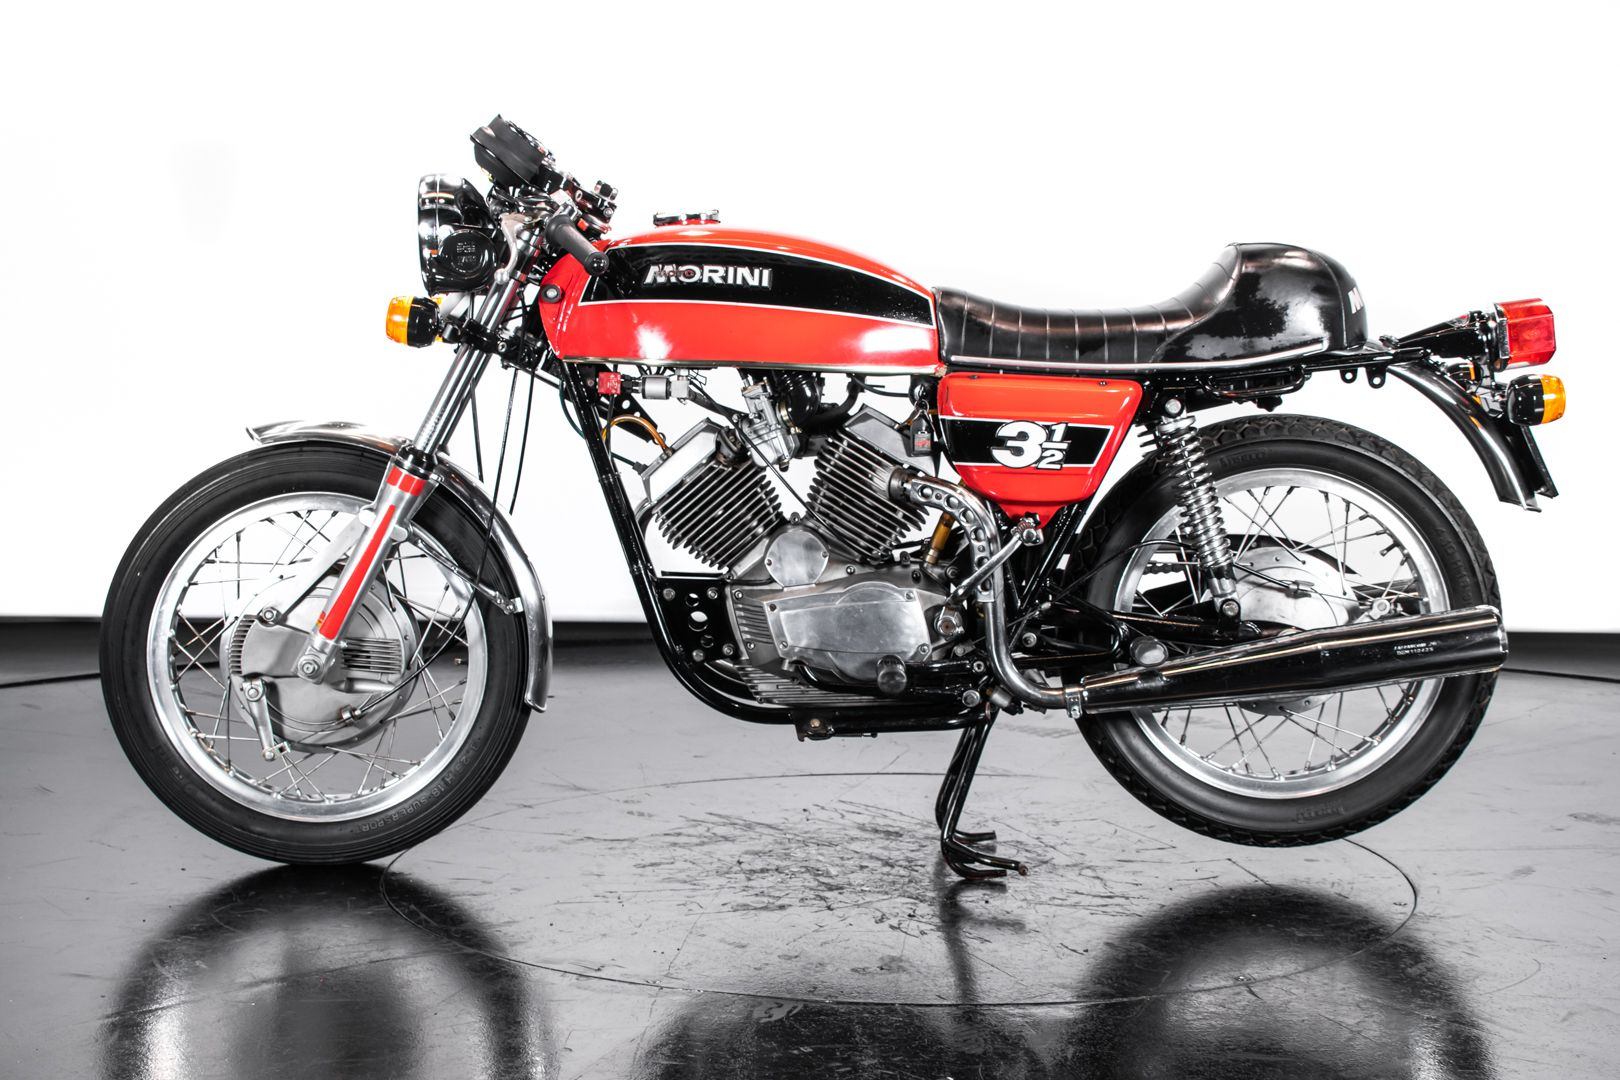 1975 Moto Morini Sport 350 78703